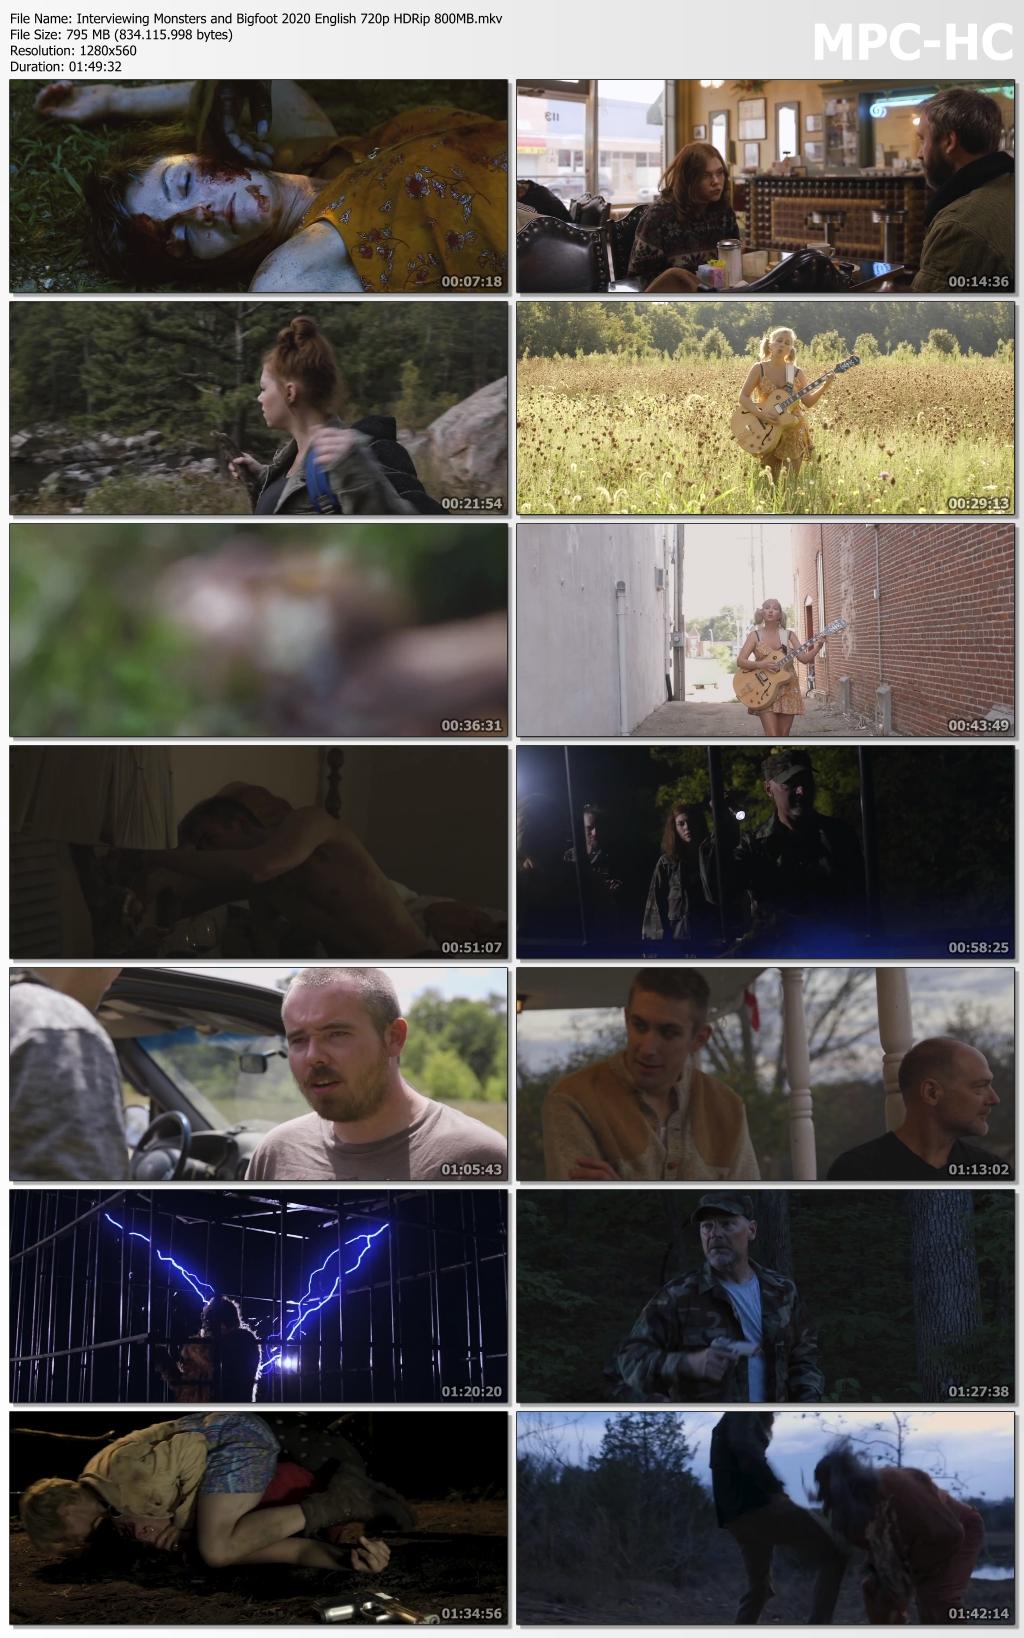 Interviewing-Monsters-and-Bigfoot-2020-English-720p-HDRip-800-MB-mkv-thumbs